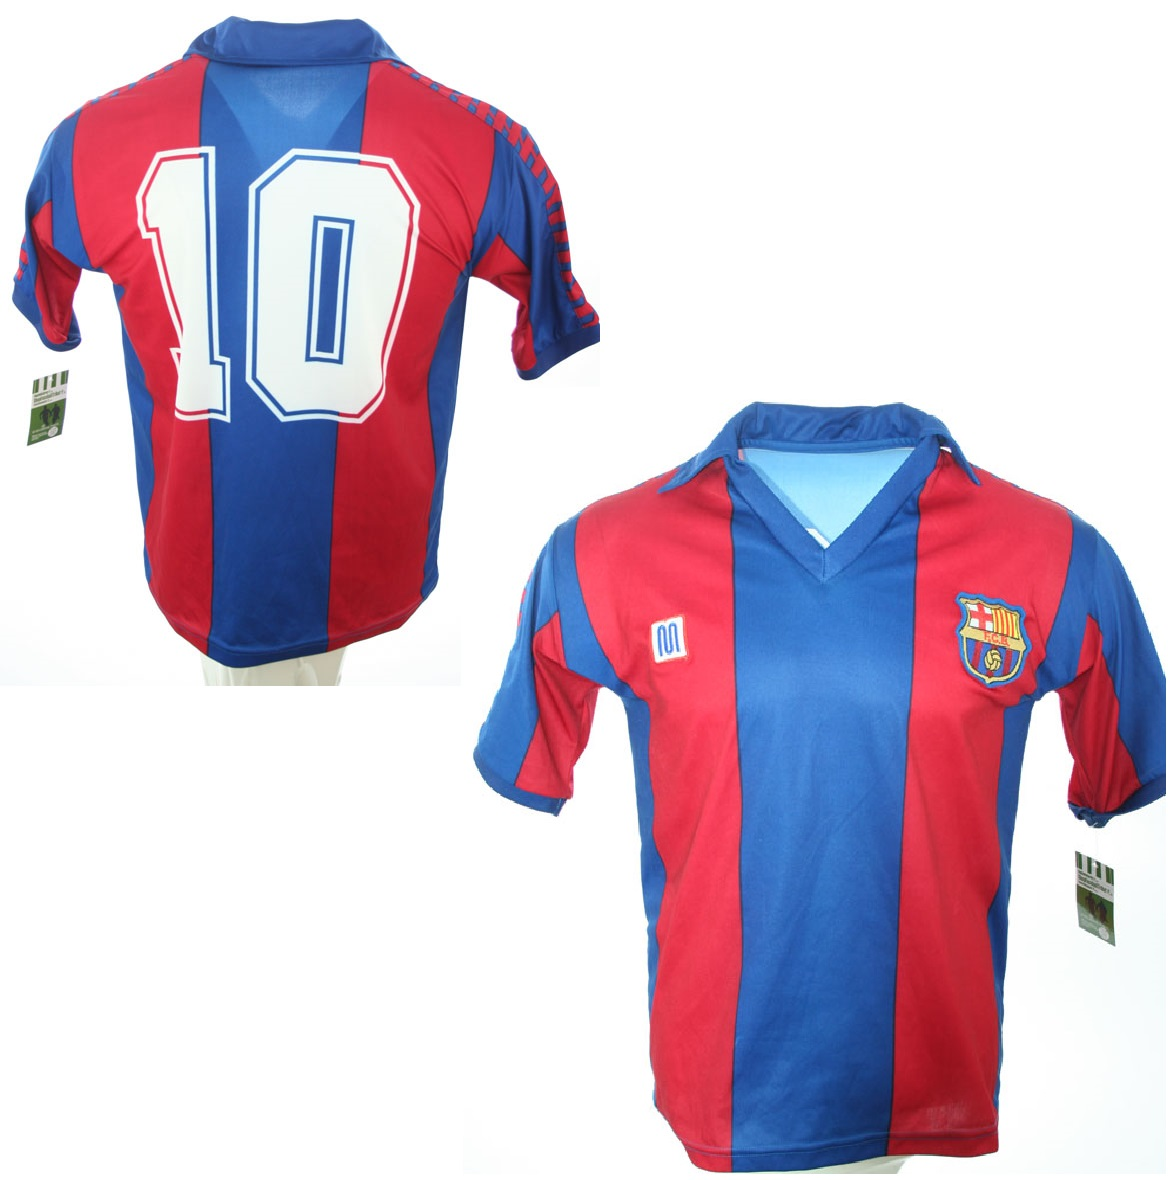 20ced11c8 Meyba FC Barcelona jersey 10 Diego Maradona 1982-84 home men s S M L ...